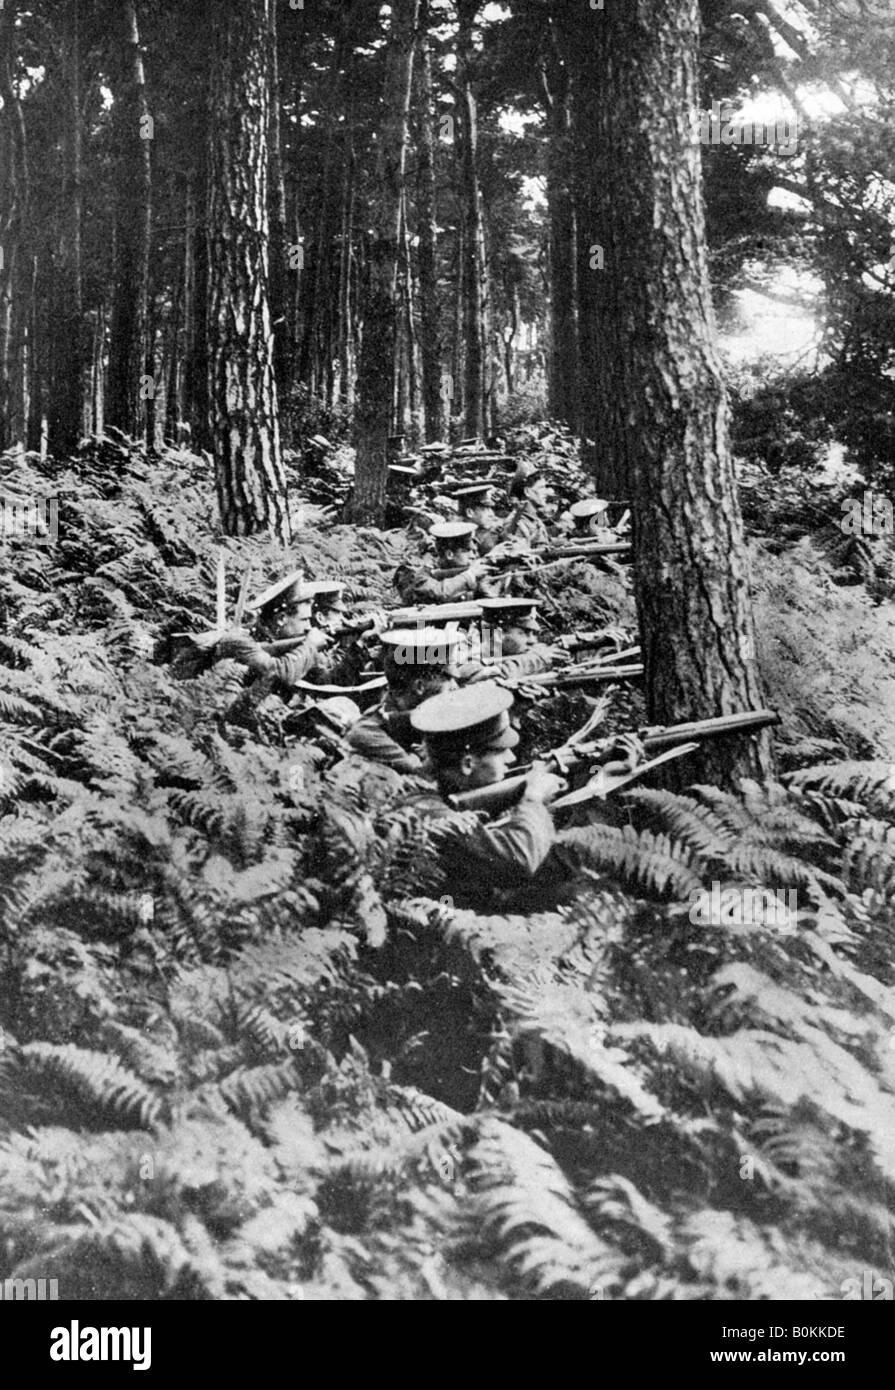 British infantry in a wood, First World War, 1914-1918, (c1920). Artist: Unknown - Stock Image